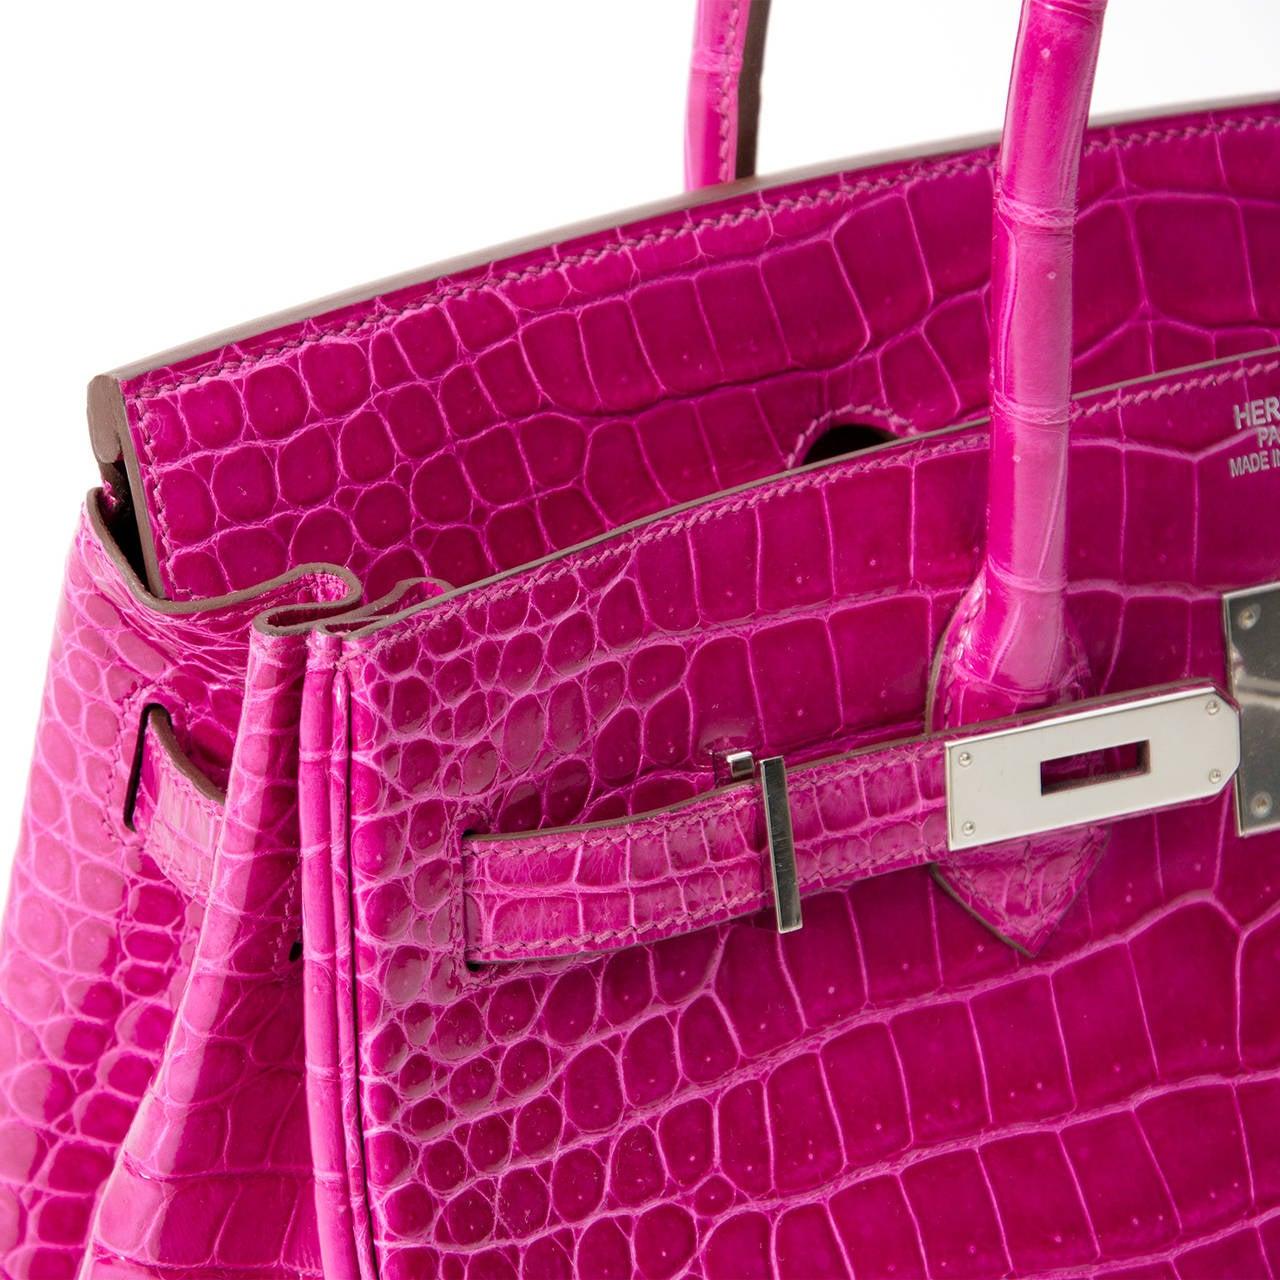 Hermès Birkin Corocodile Porosus PHW Rose Sheherazade 35 3